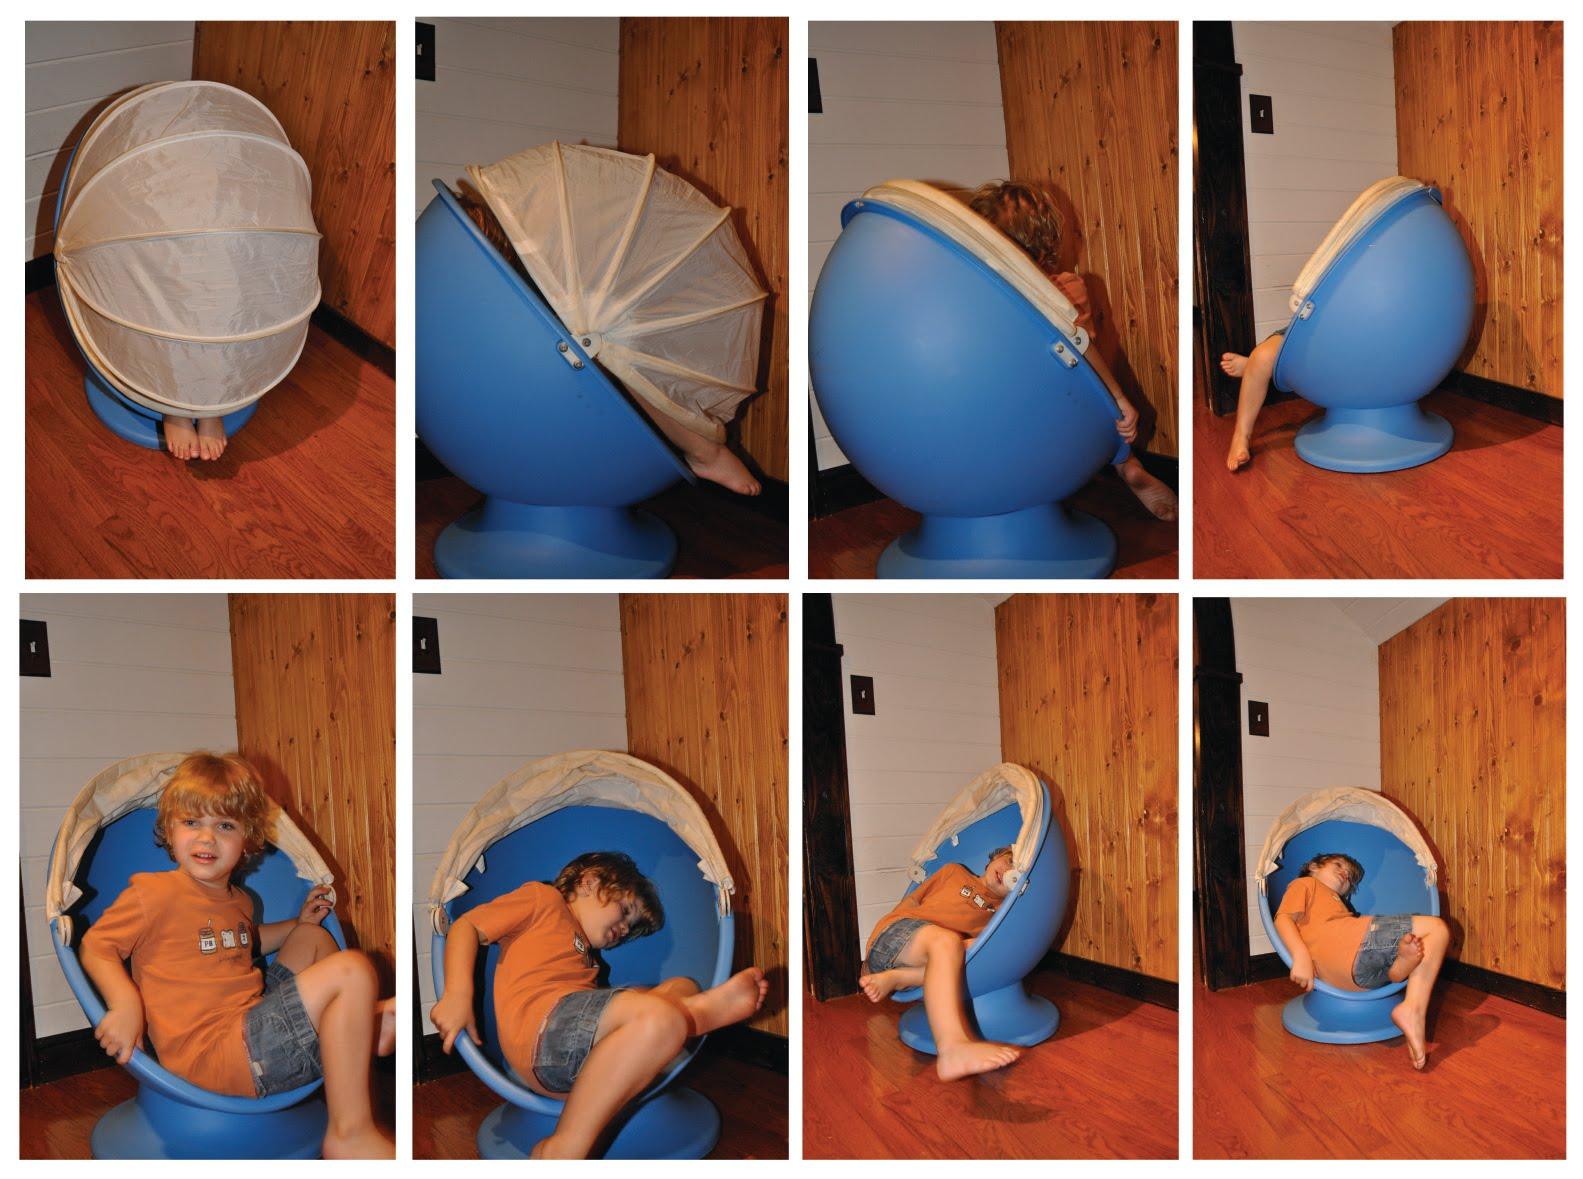 egg chairs ikea round theater chair ewe hooo summer entertainment the